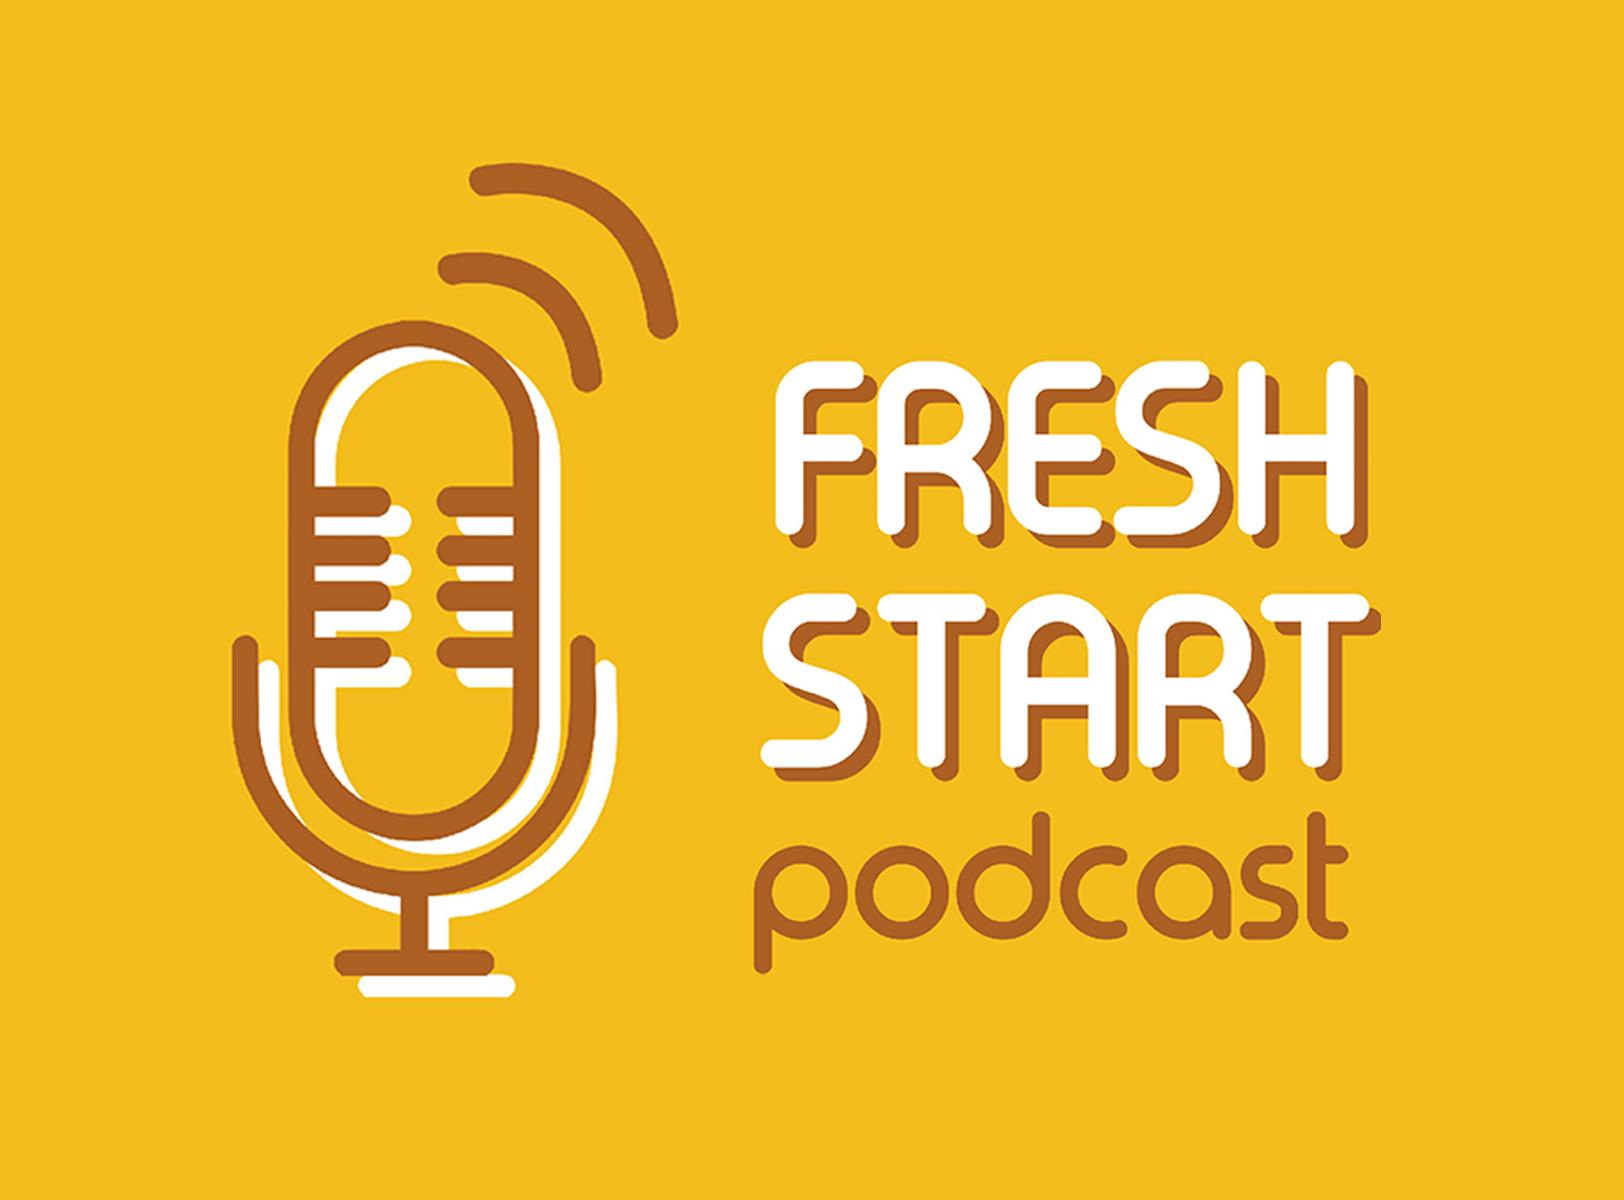 Fresh Start: Podcast News (1/31/2019 Thu.)